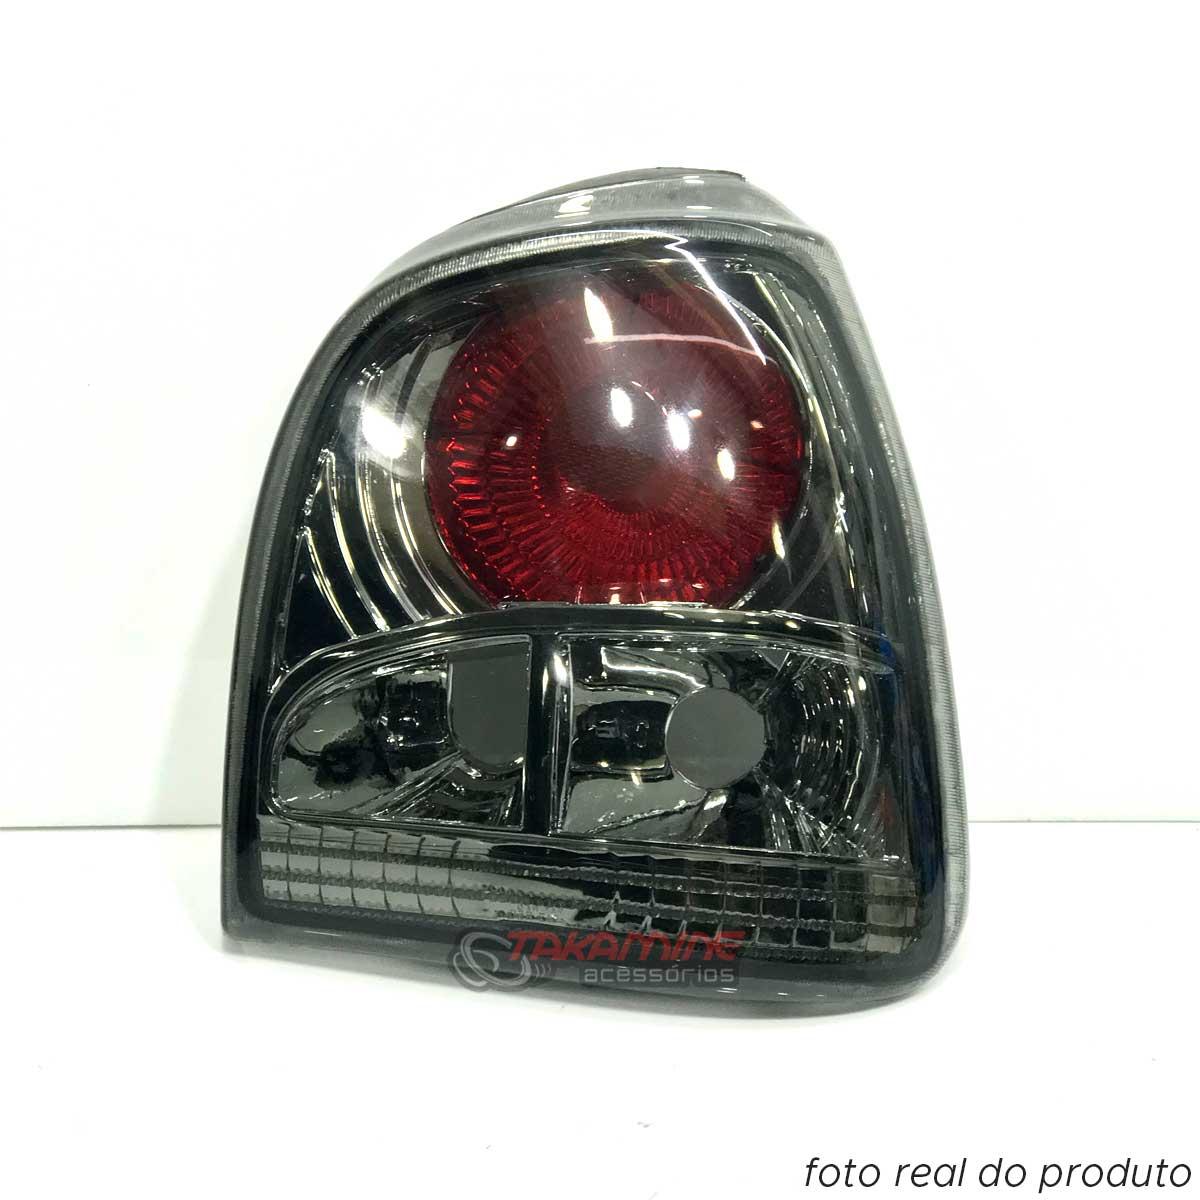 Lanterna traseira Gol Bola 1995 1996 1997 1998 1999 Evolution II fume modelo arteb lado direito